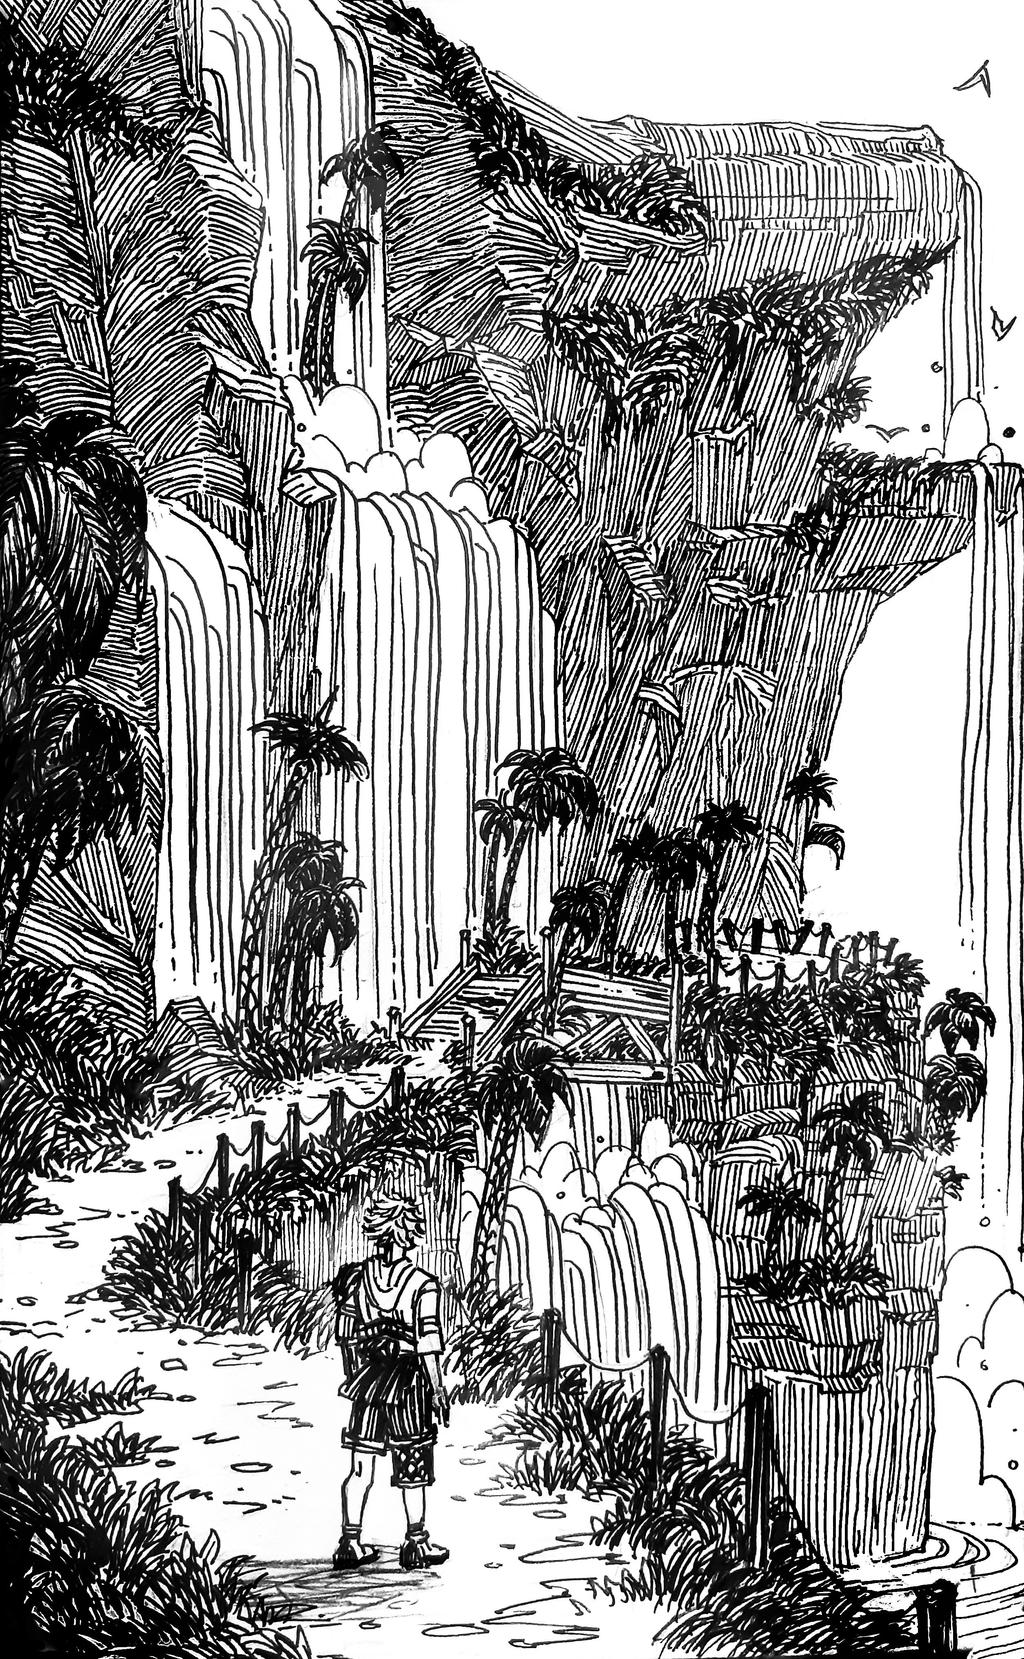 Besaid Falls (Final Fantasy X)